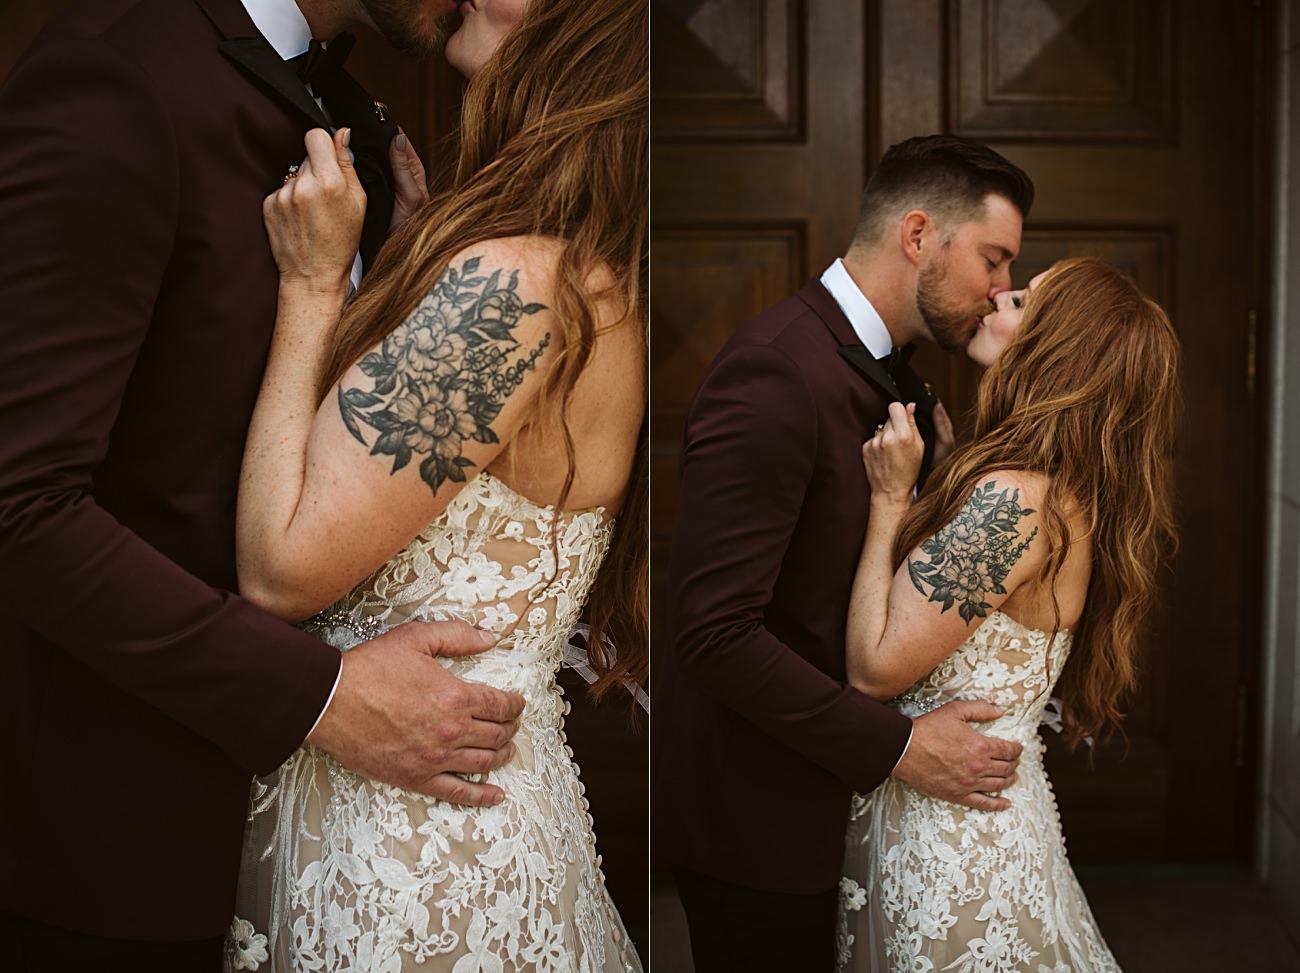 Madison Capital Building wedding party photos, Madison Wisconsin Wedding, Tattoo Bride